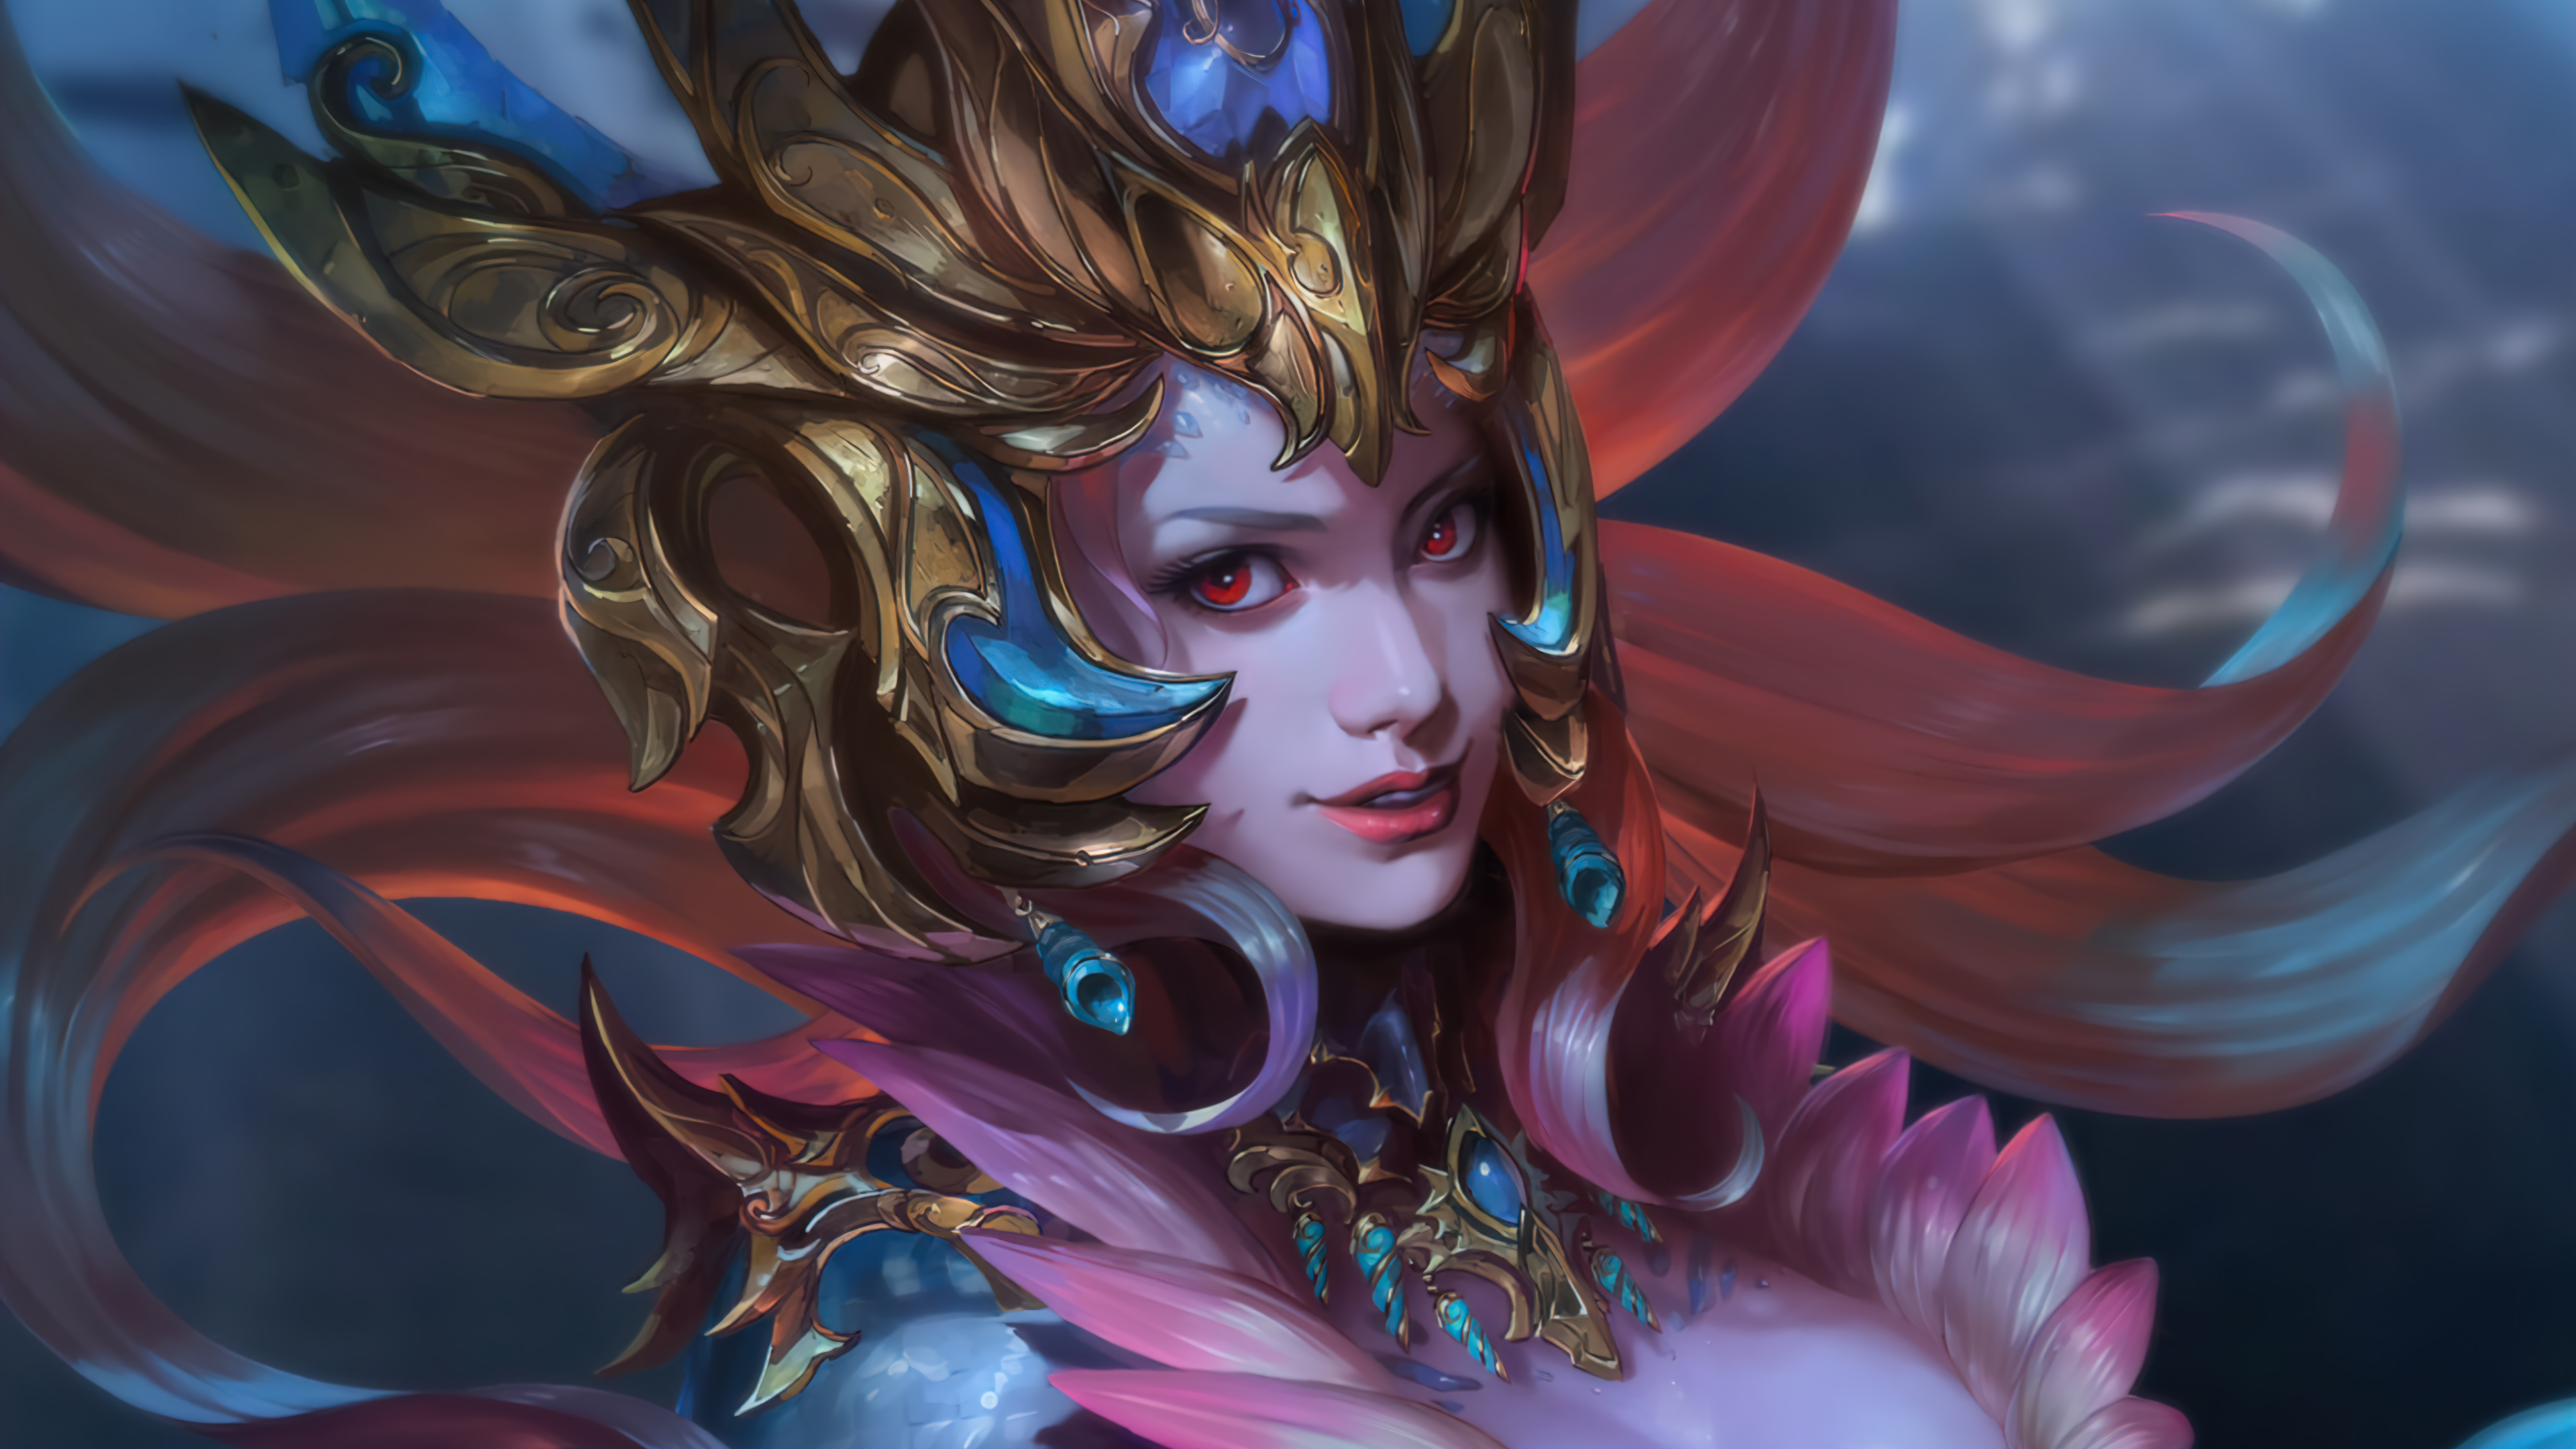 Wallpaper Nami League of Legends Art